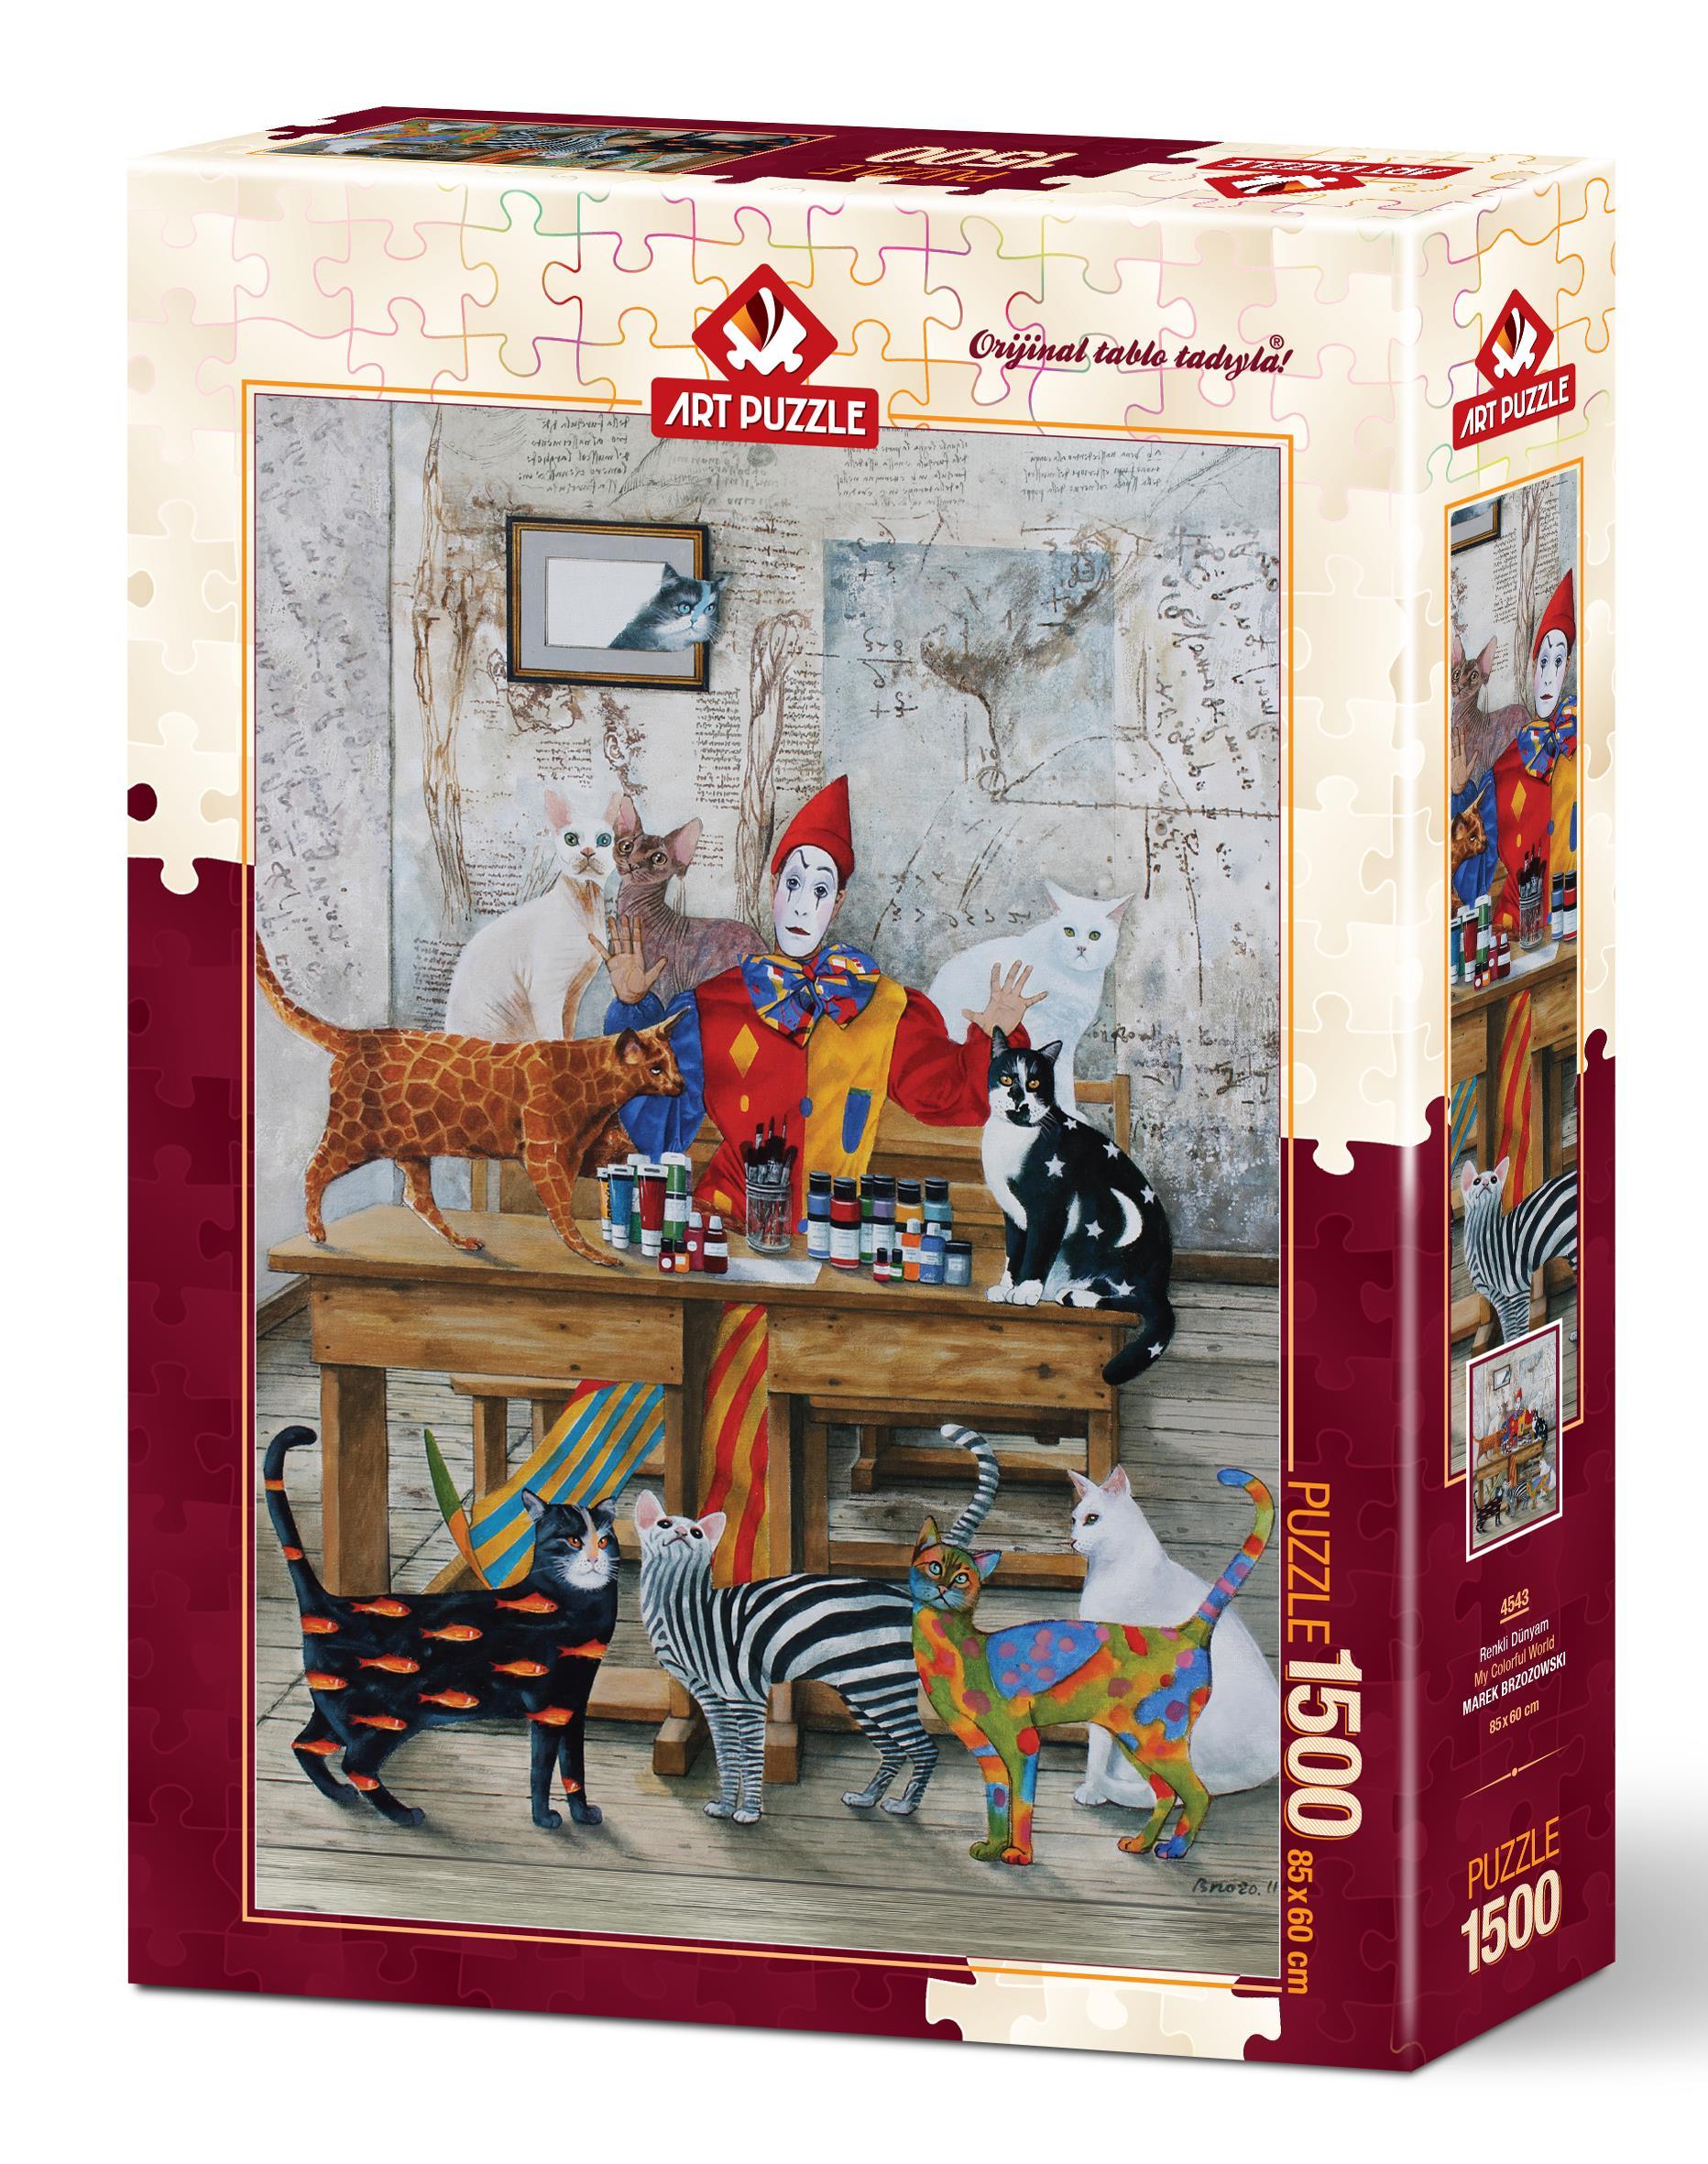 Art Puzzle 4543 Renkli Dünyam 1500 Parça Puzzle